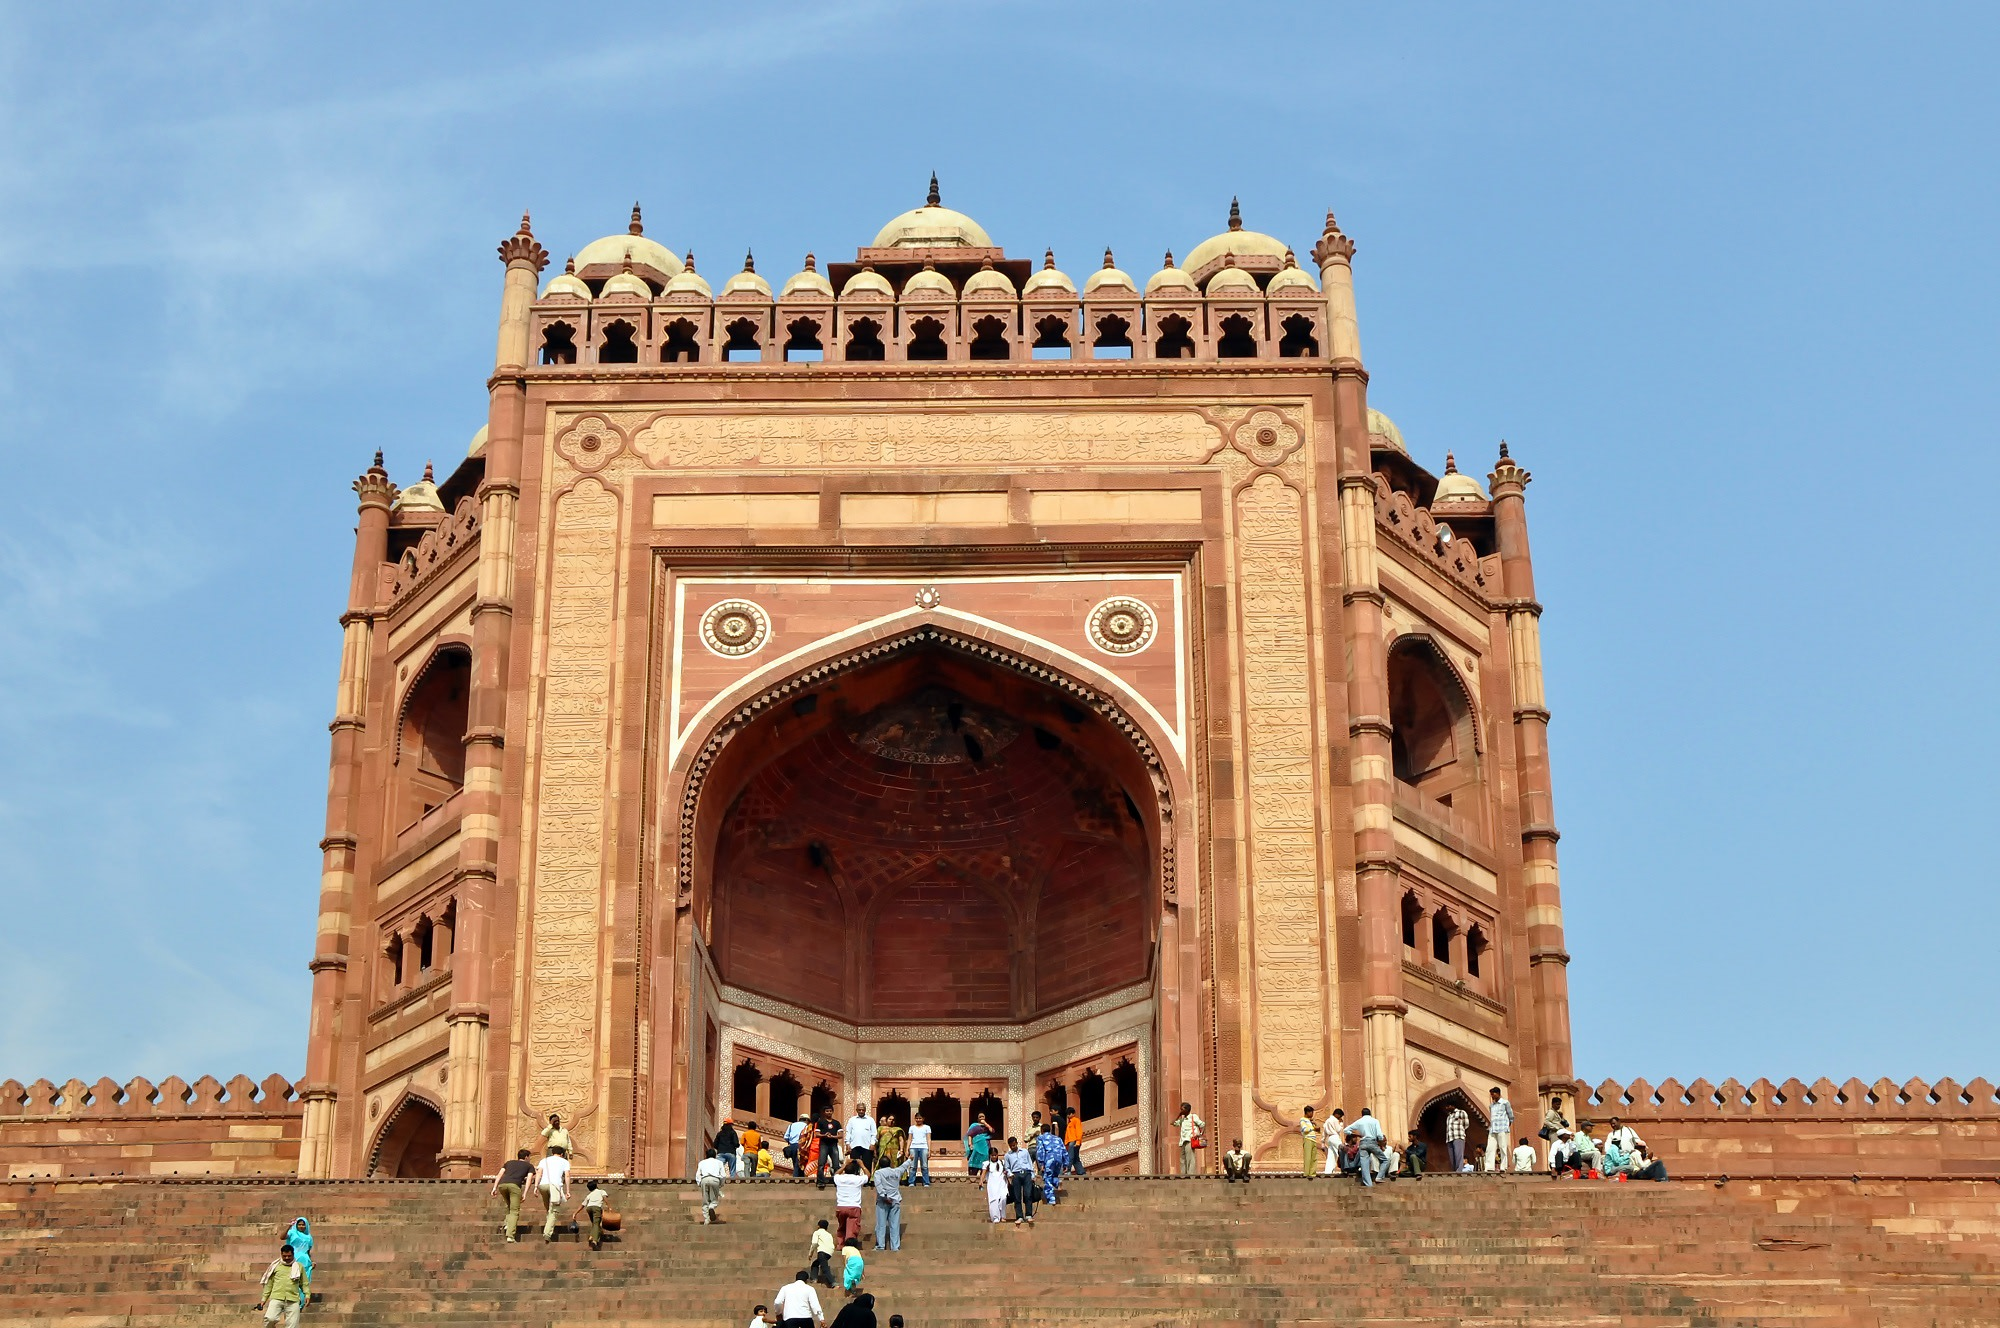 Buland Darwaza in Fatehpur Sikri